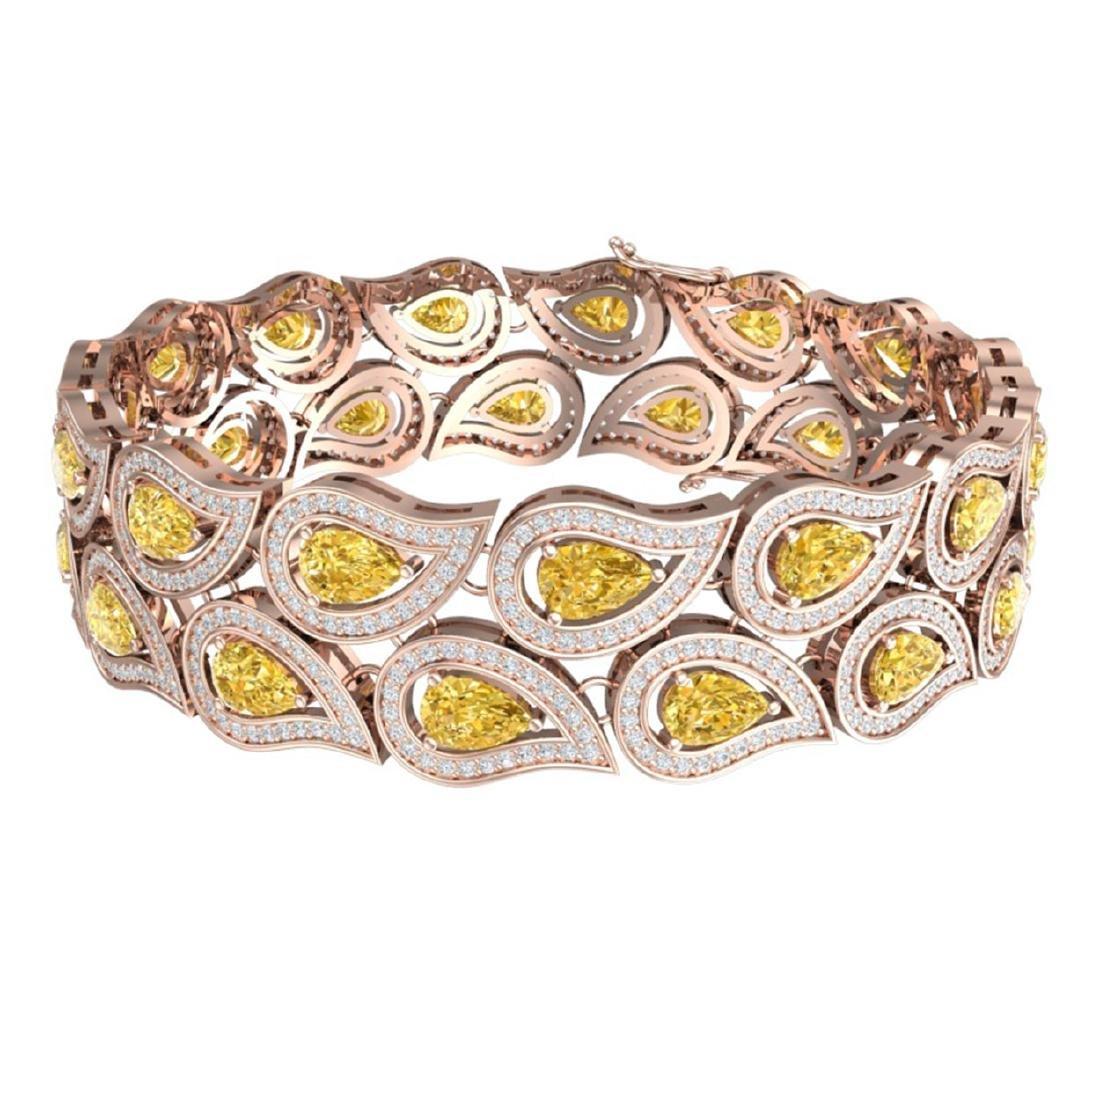 18.61 ctw Canary Citrine & VS Diamond Bracelet 18K Rose - 3